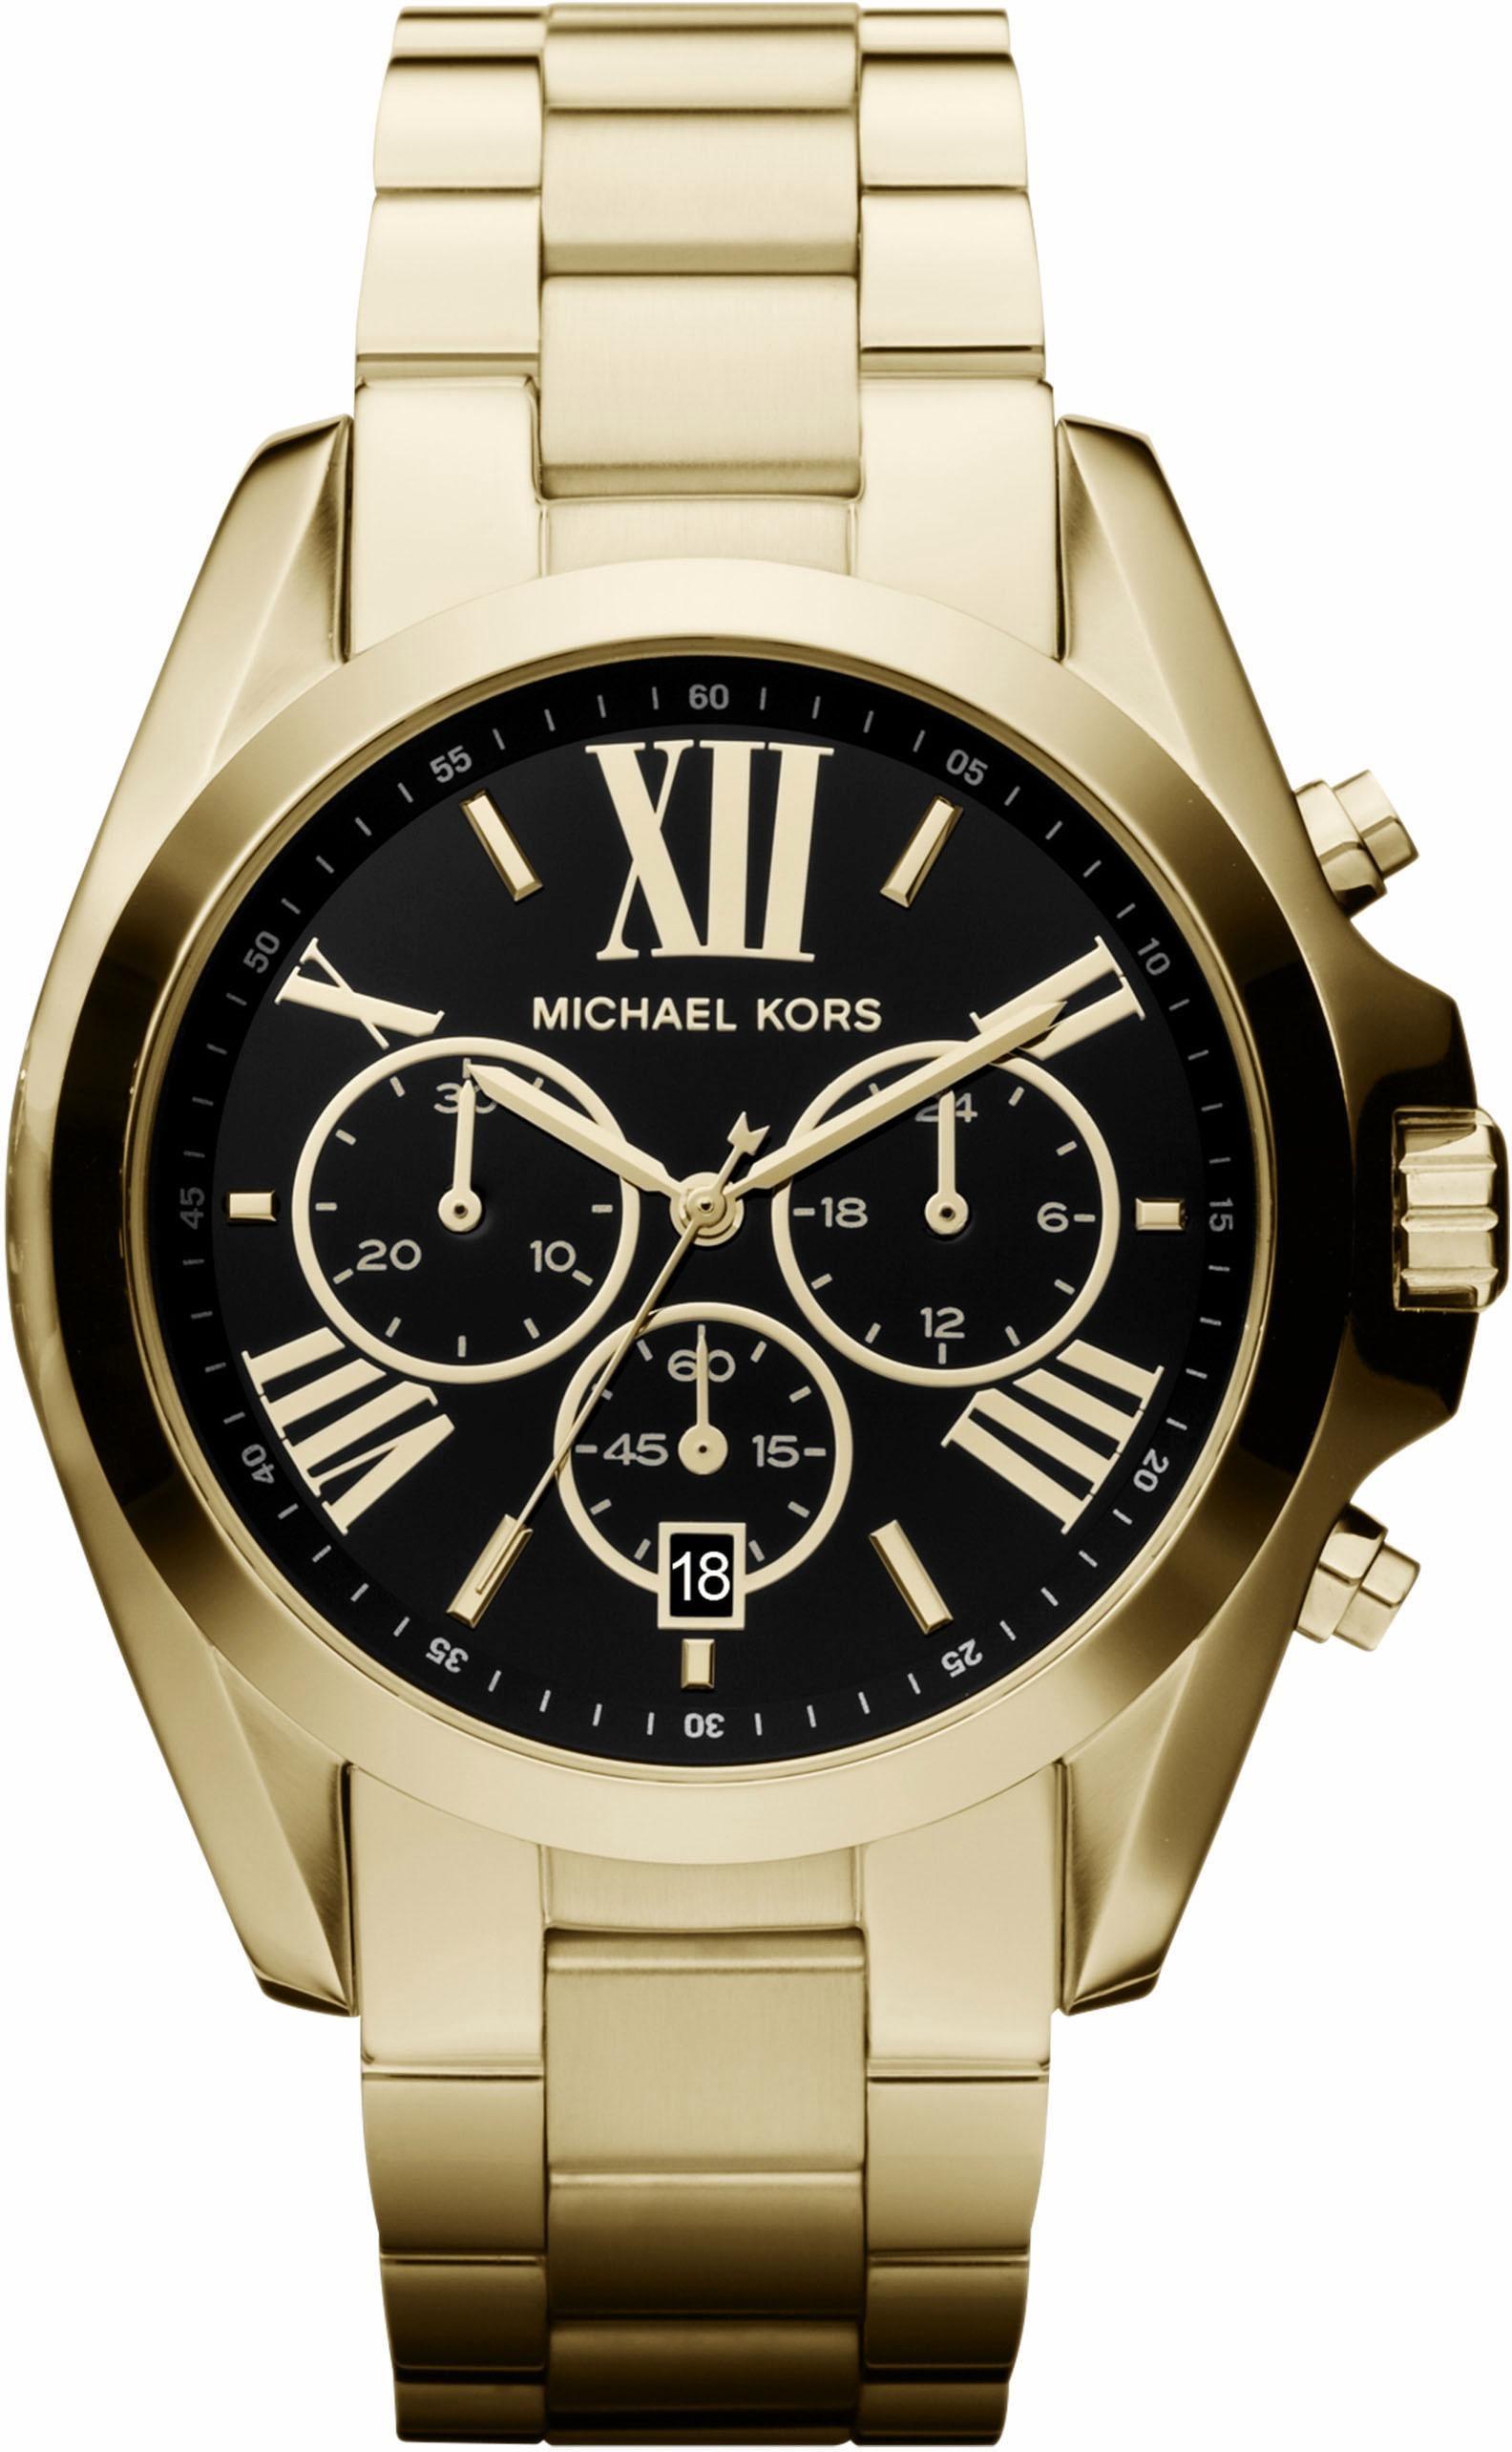 MICHAEL KORS Chronograph BRADSHAW, MK5739 | Uhren > Chronographen | Michael Kors